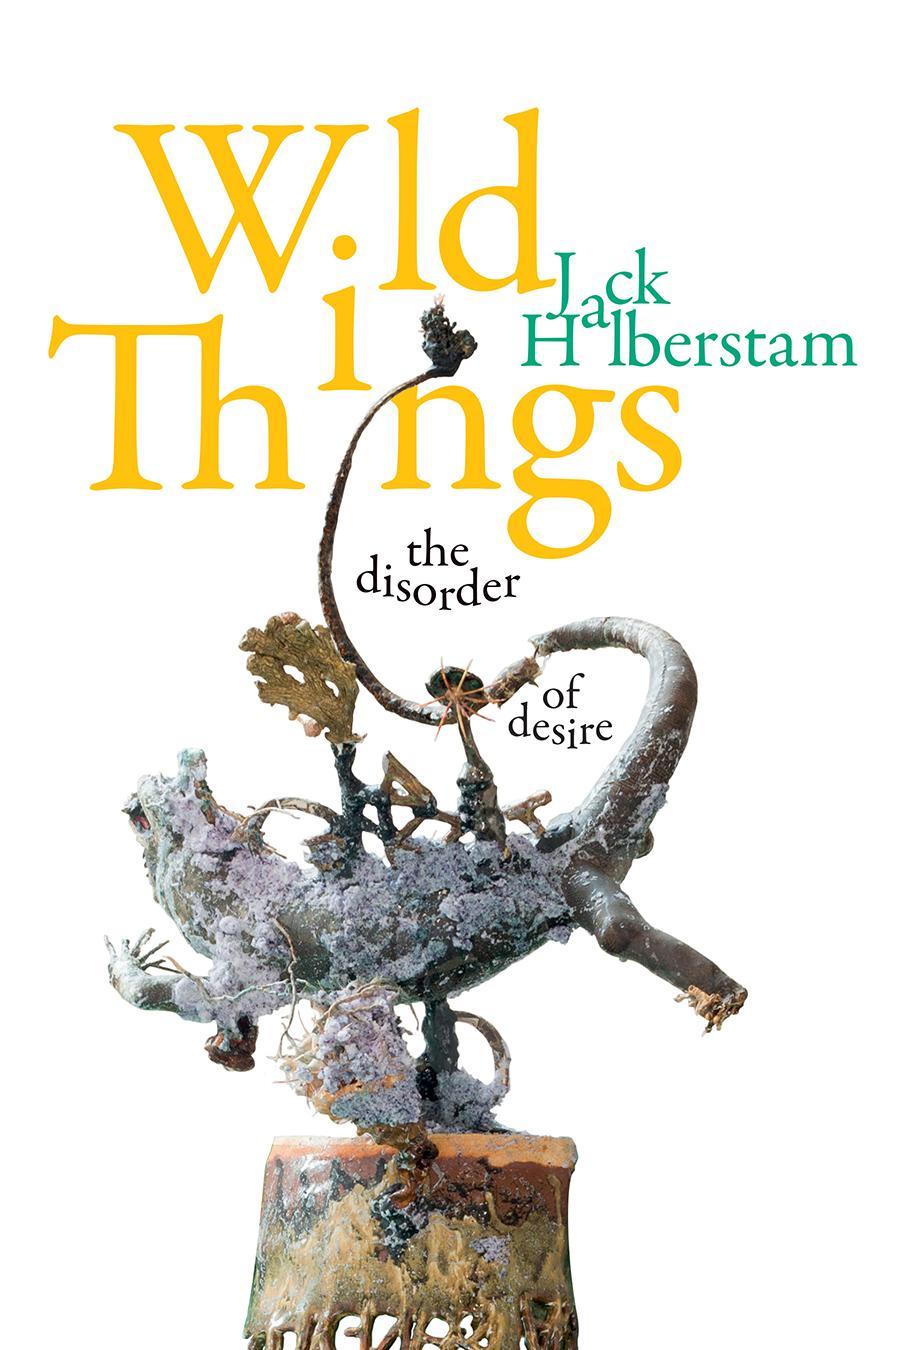 Jack Halberstam, Wild Things: The Disorder of Desire, 2020. Courtesy: Duke University Press